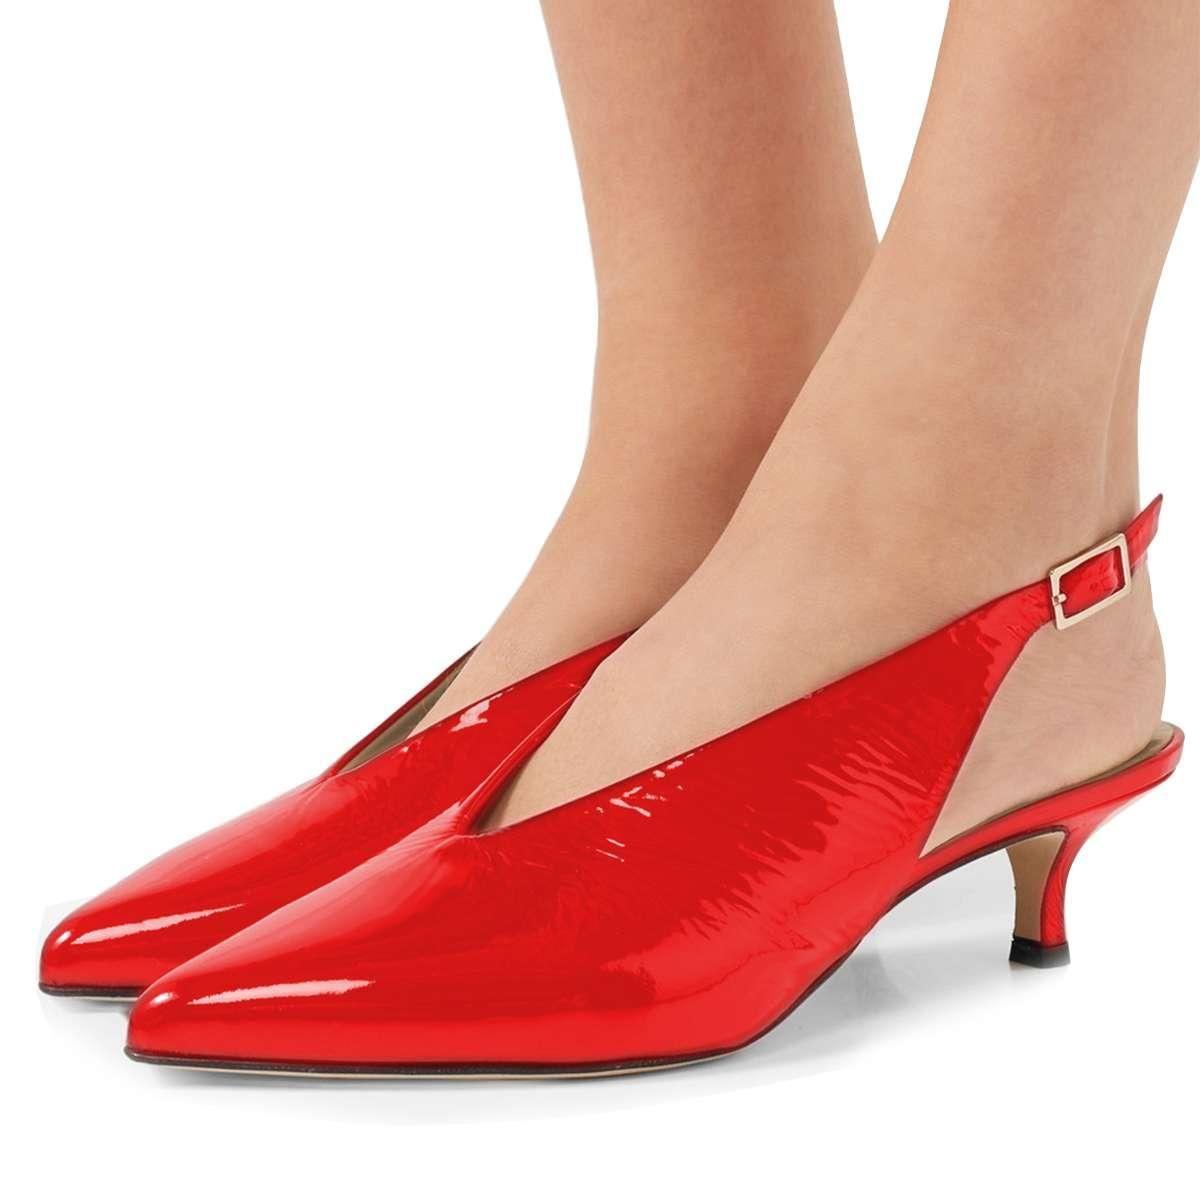 Adorewe Fsjshoes Fsj Shoes Red Mirror Leather Kitten Heel Slingback Pumps Adorewe Com Slingback Pump Kitten Heels Shoes Heels Classy